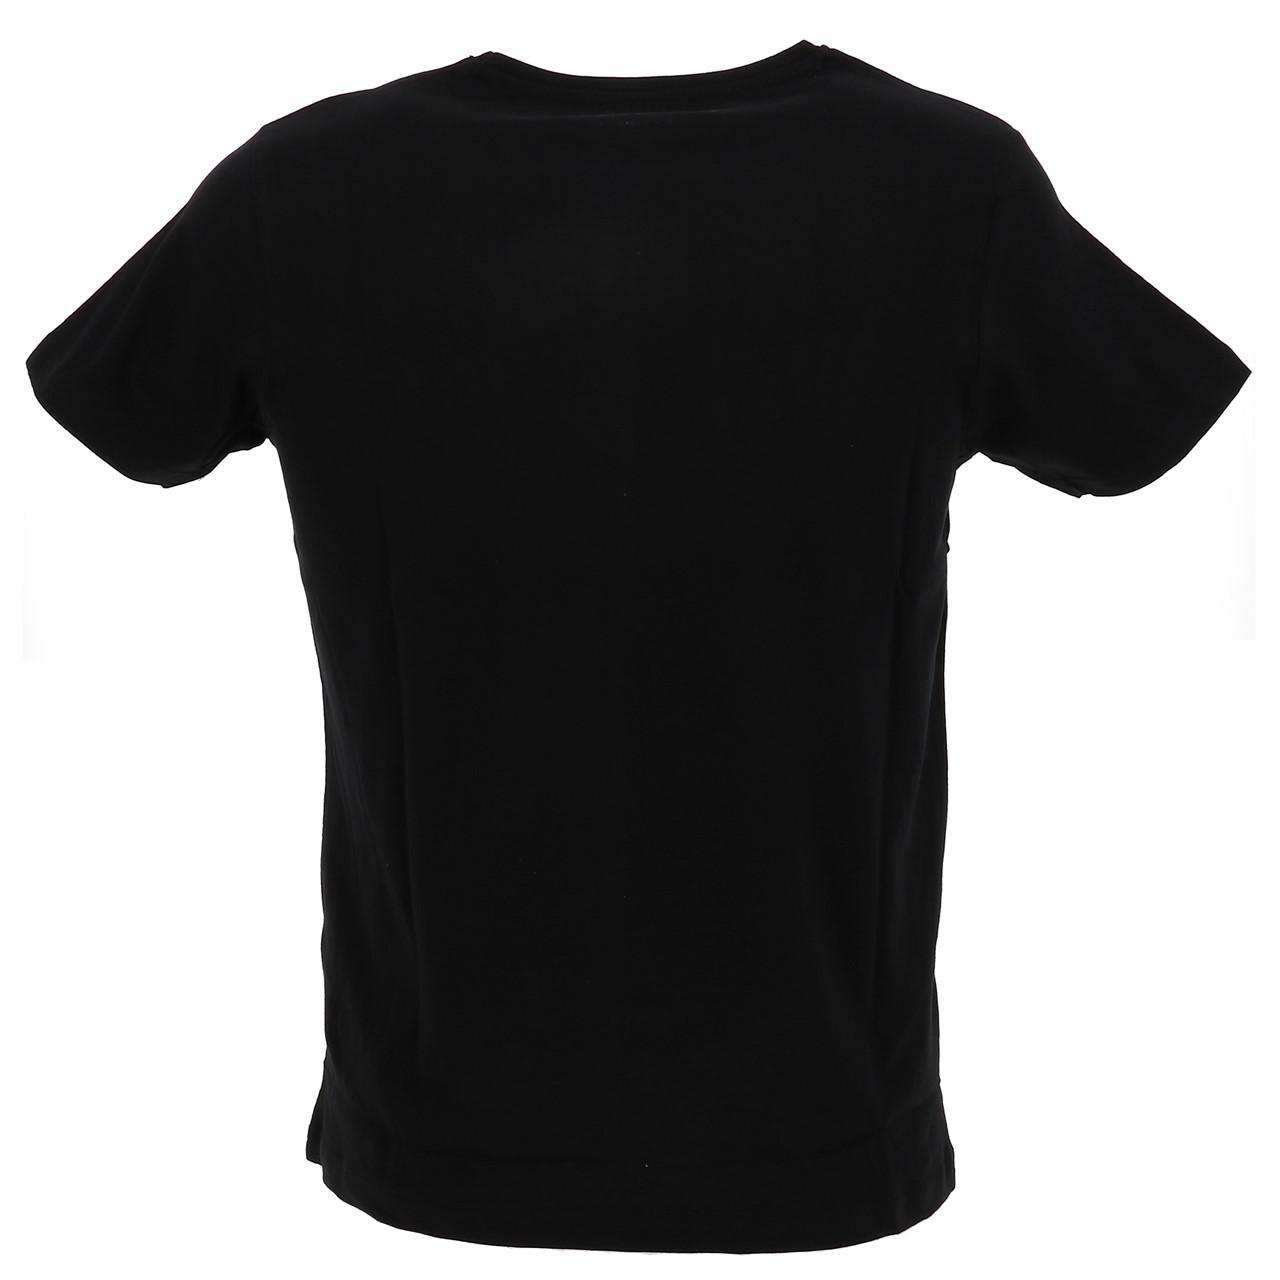 Short-Sleeve-T-Shirt-Paname-Brothers-Merico-Black-Mc-Tee-Black-26749-New thumbnail 5